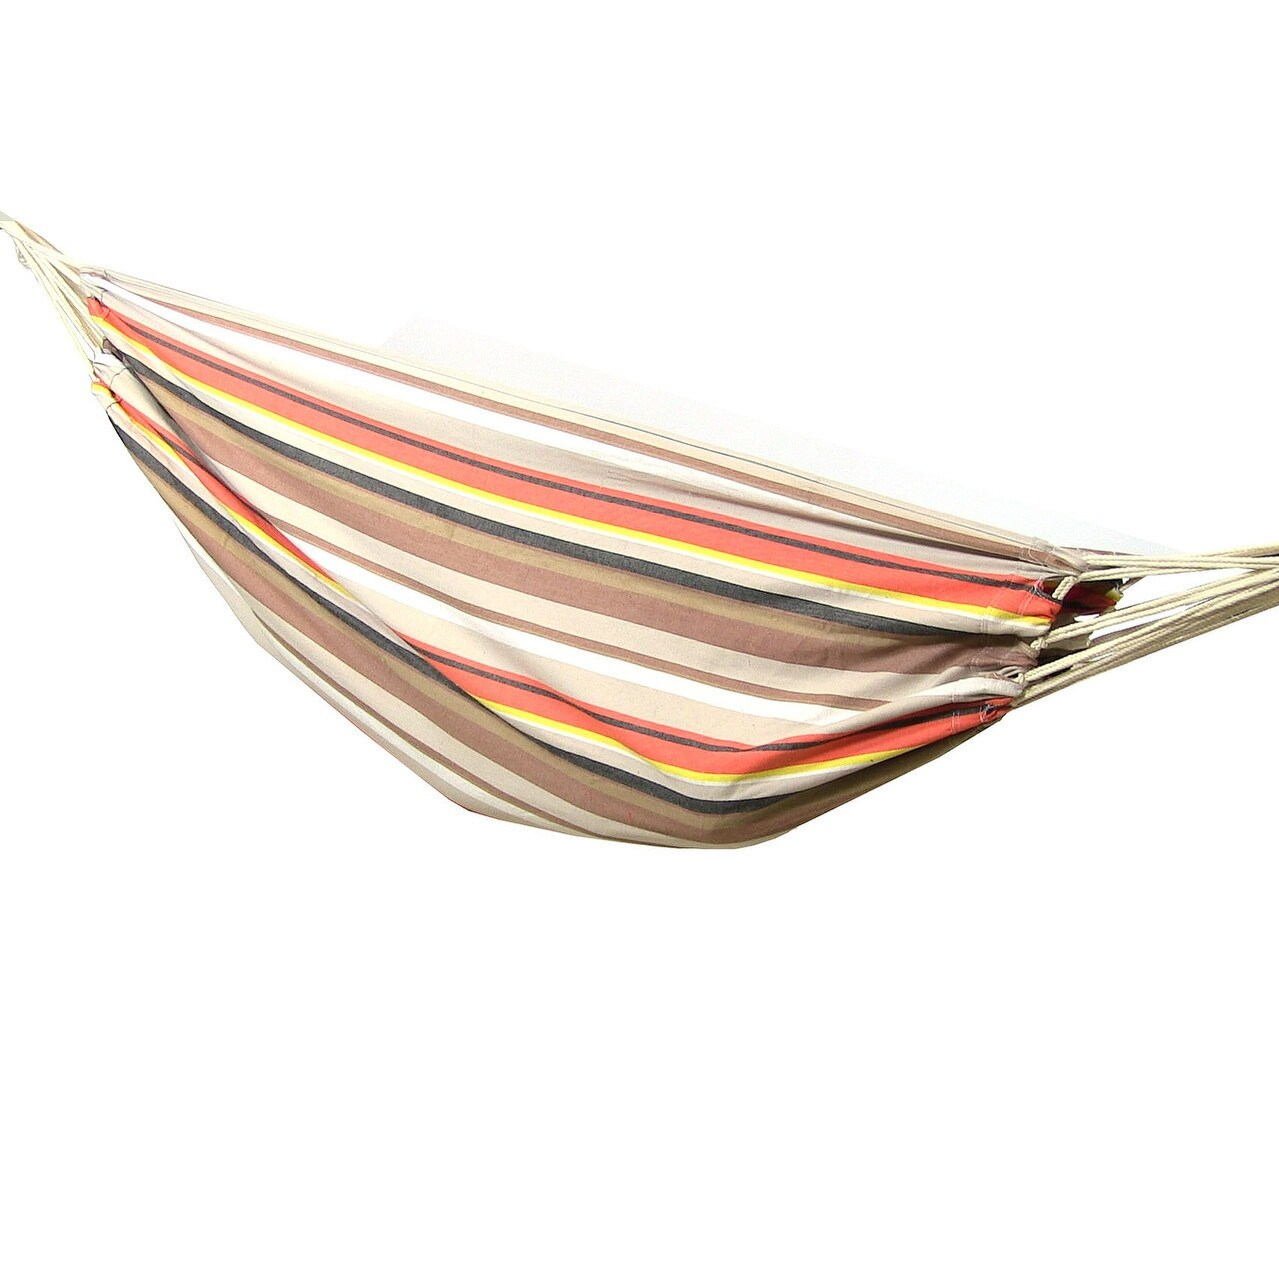 Sunnydaze Premium 100 % Natural Tightly Woven Cotton Double Brazilian Hammock - Thumbnail 6